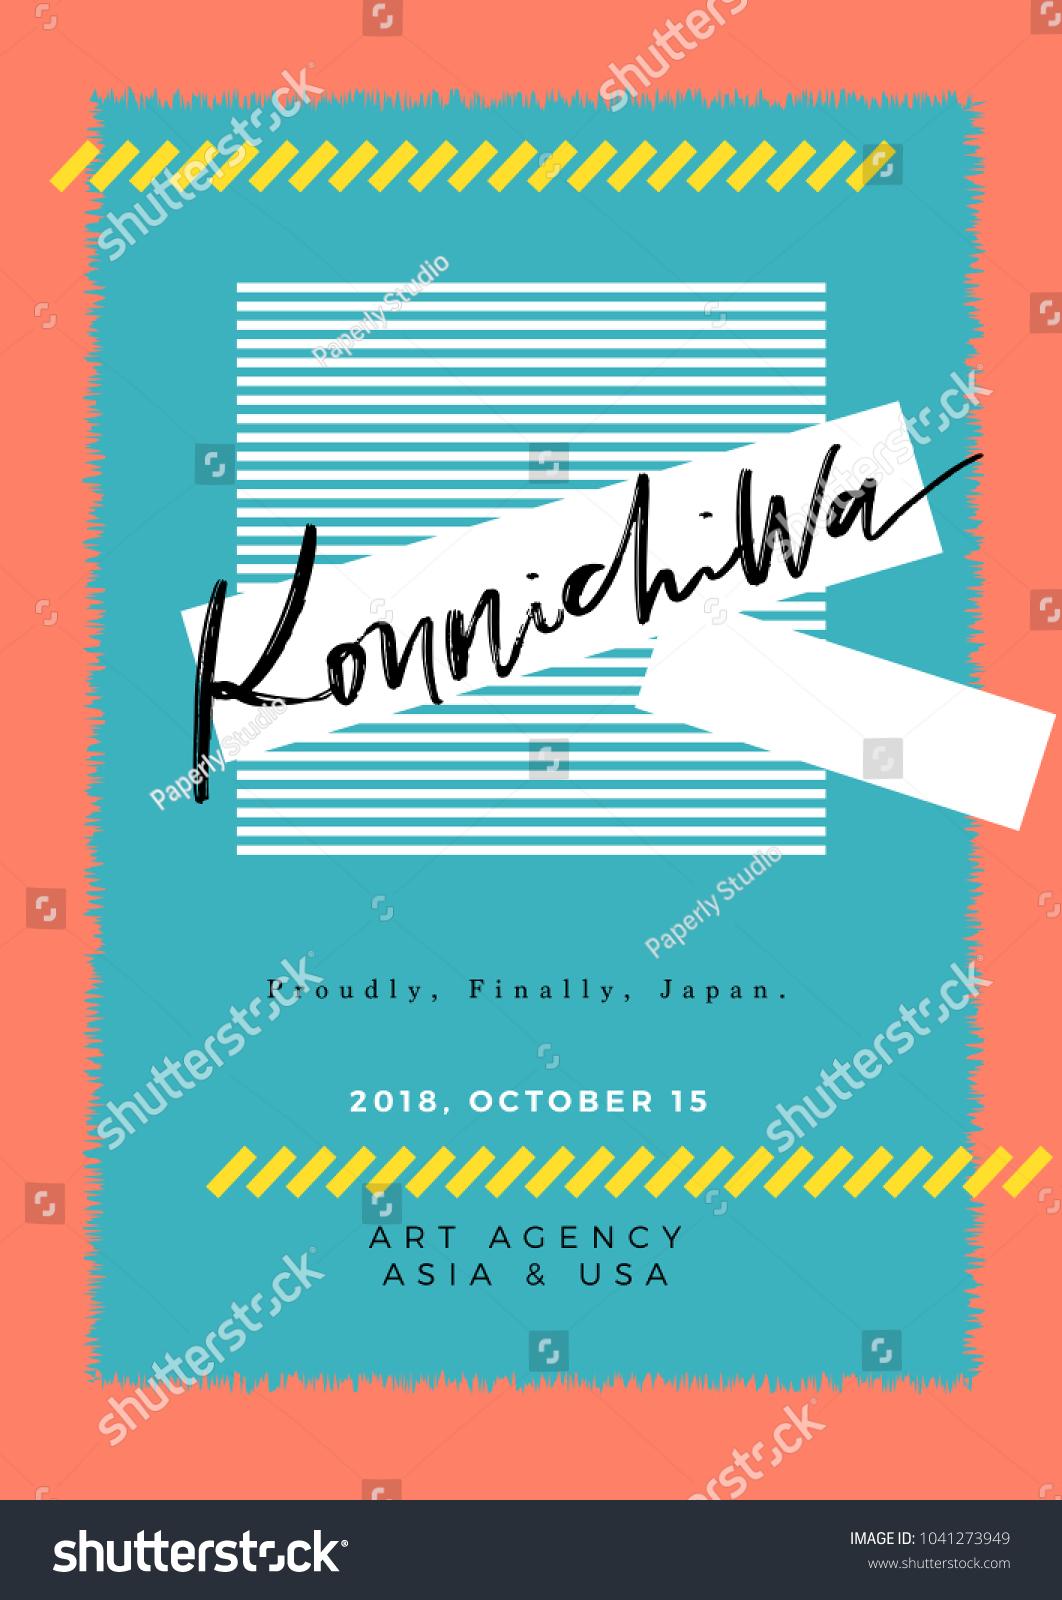 Hello Different Language Poster Konnichiwa Japanese Stock Vector